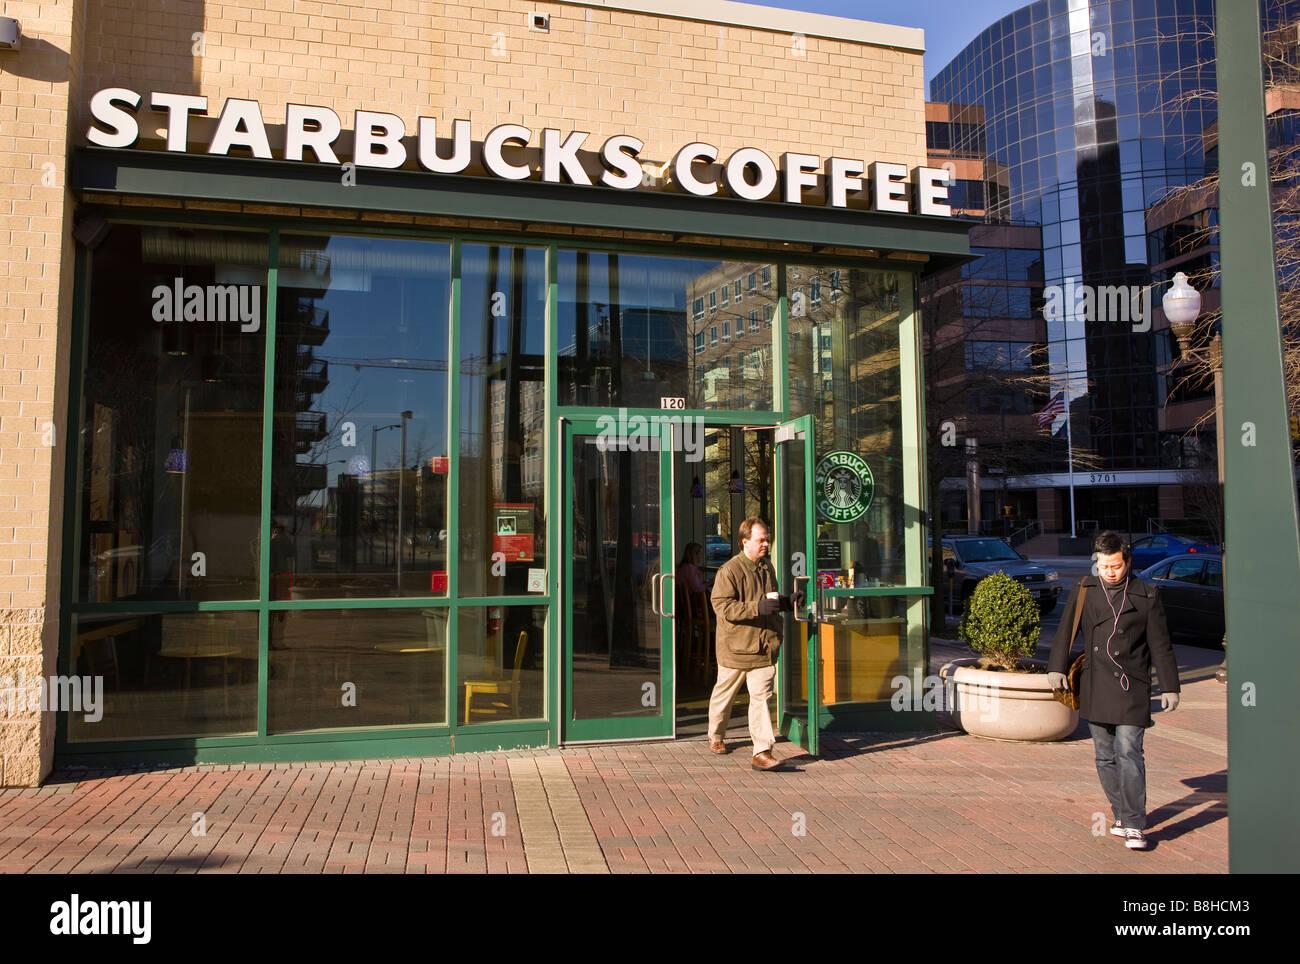 bb33e16f4a ARLINGTON VIRGINIA USA Starbucks coffee shop and people on sidewalk ...